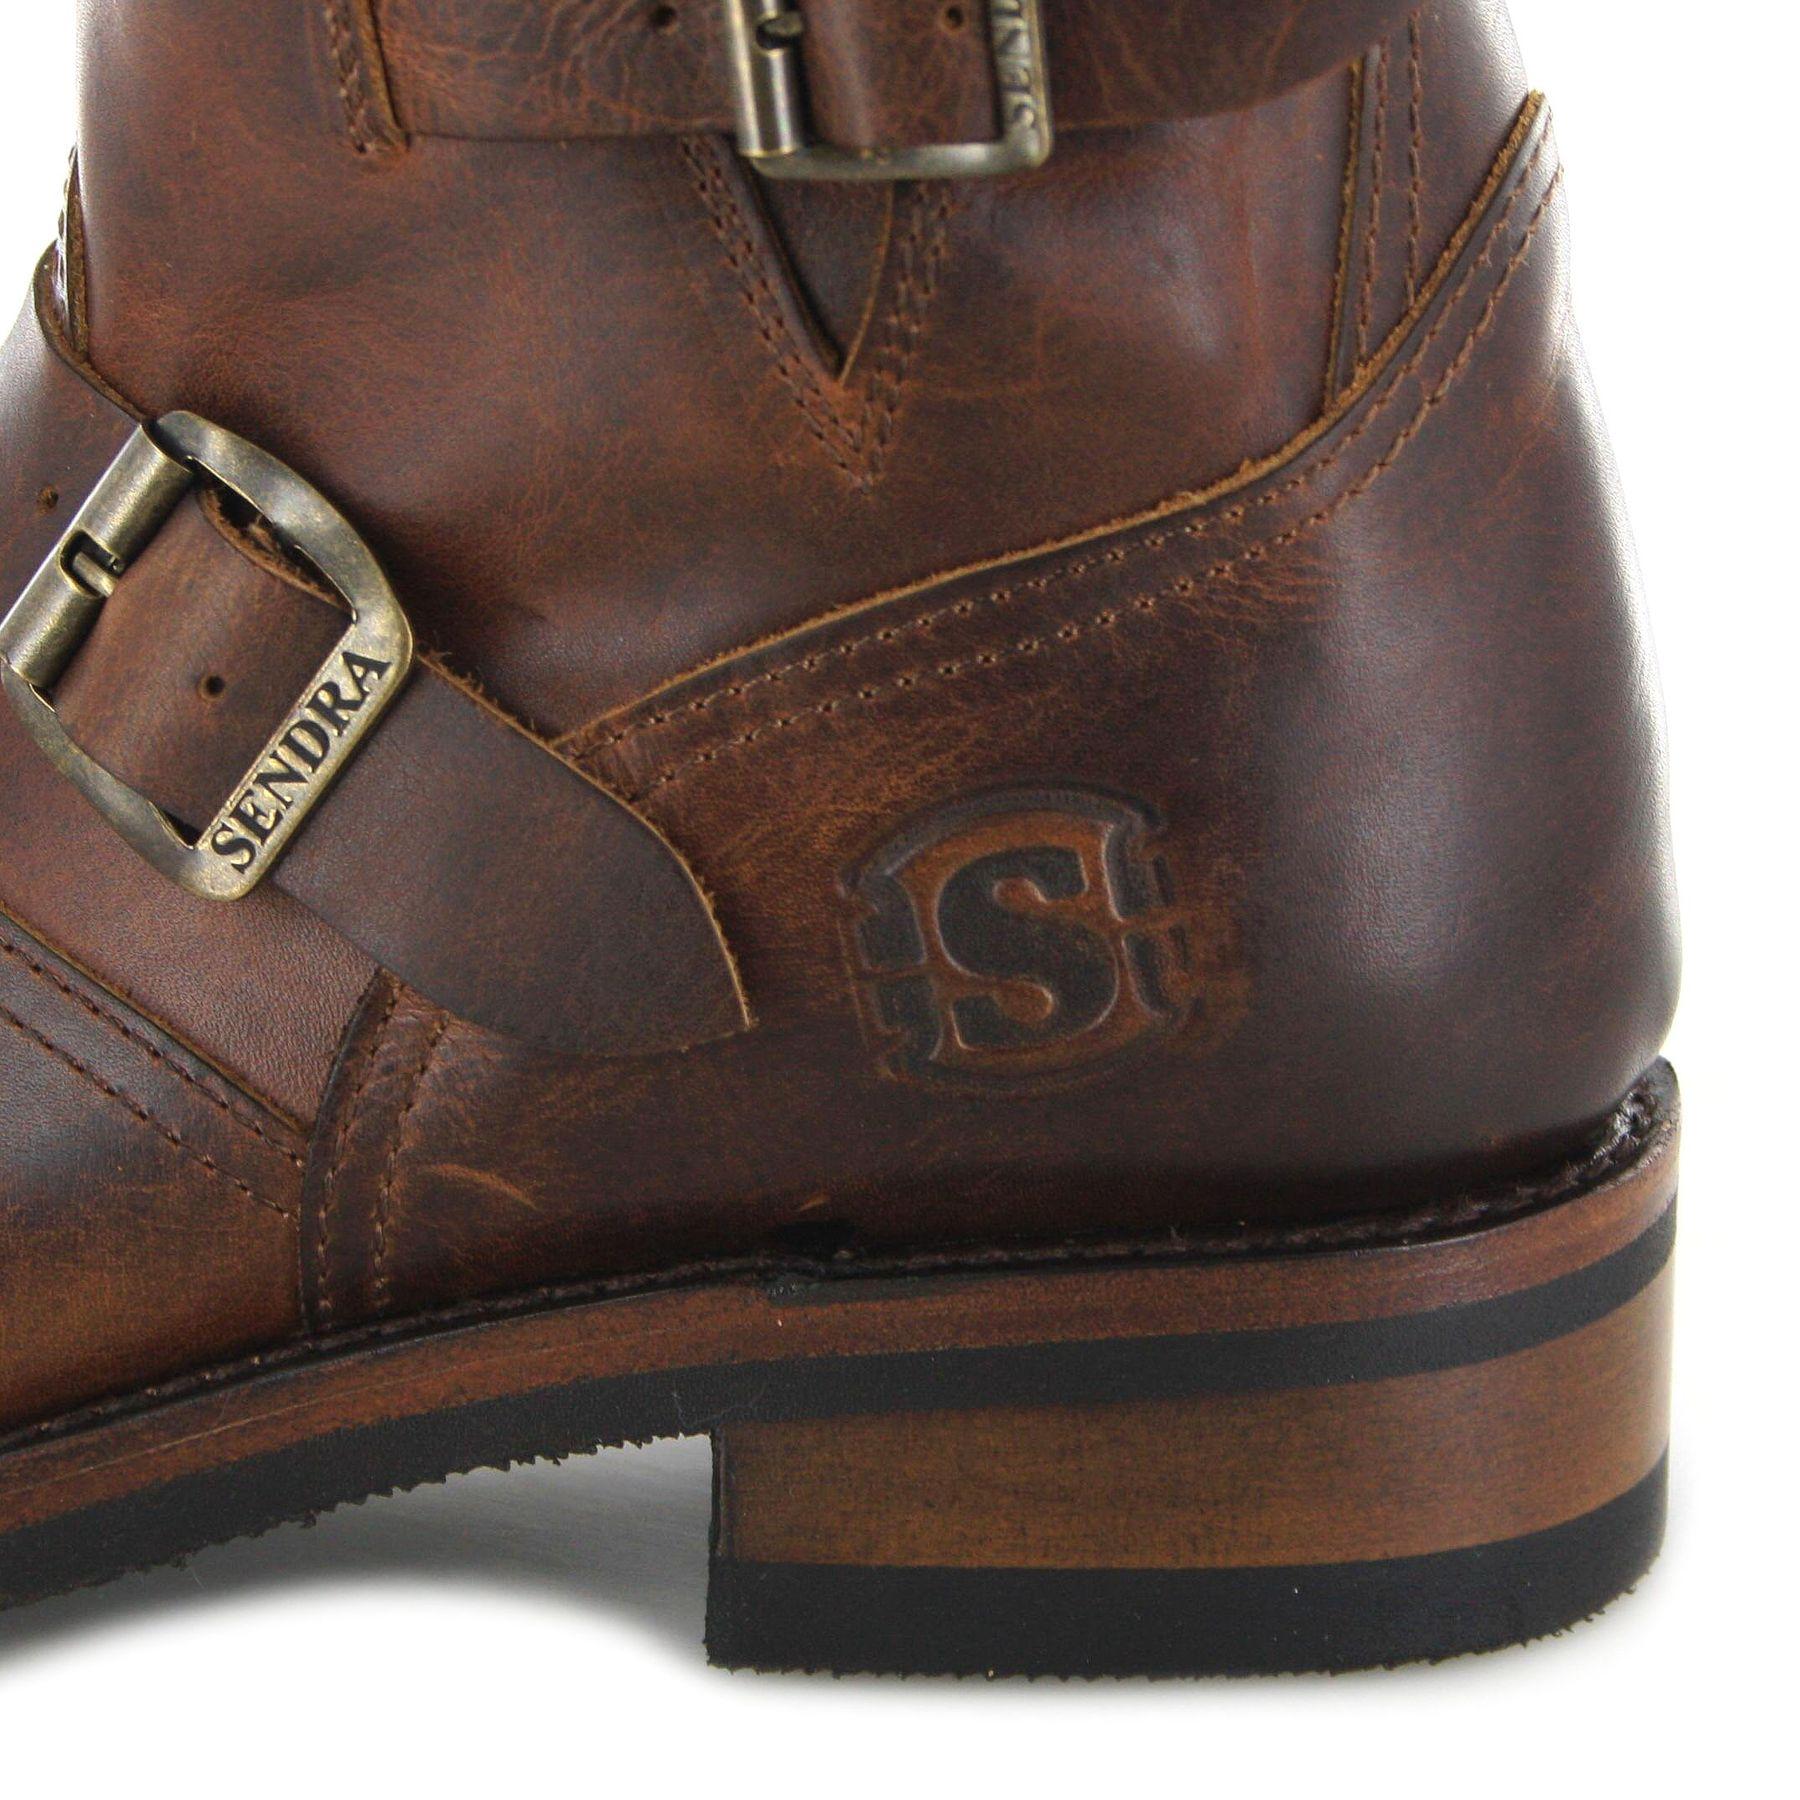 sendra boots 2976 evolution engineer men ankle boot with. Black Bedroom Furniture Sets. Home Design Ideas